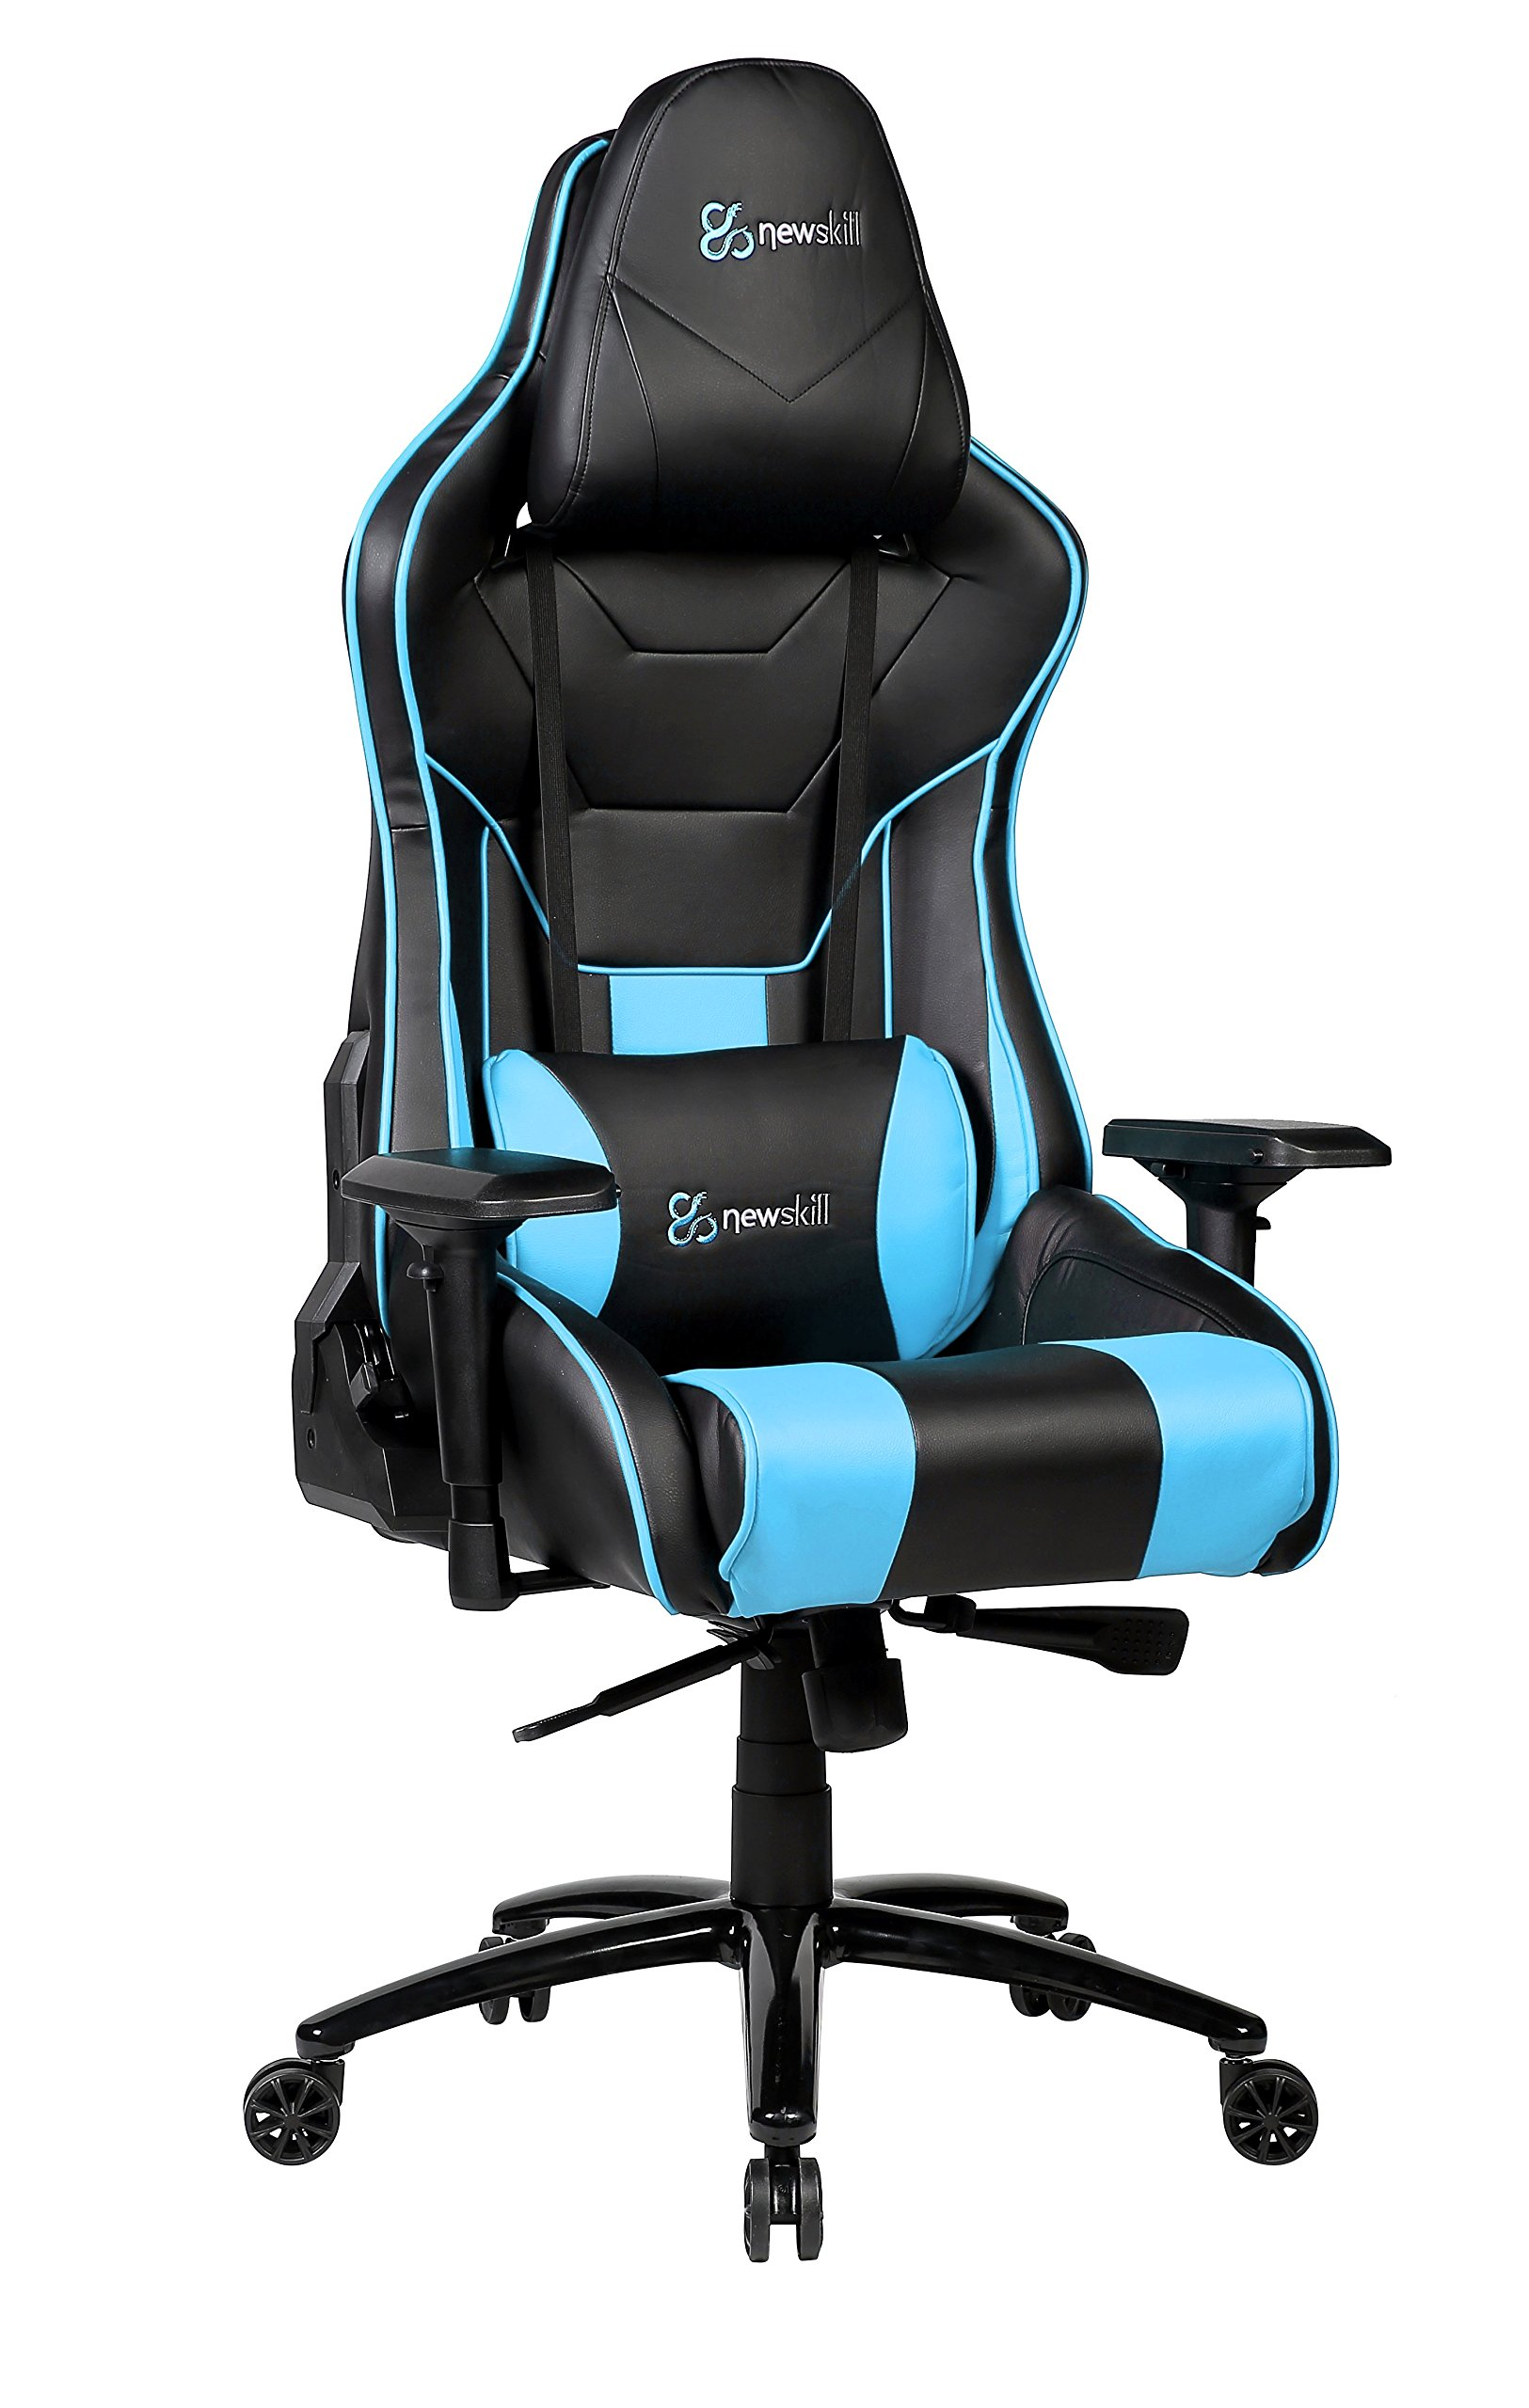 Newskill Kuraokami – Silla Gaming Profesional (Inclinación y Altura Regulable, reposabrazos Ajustable, reclinable 180º), Color Azul